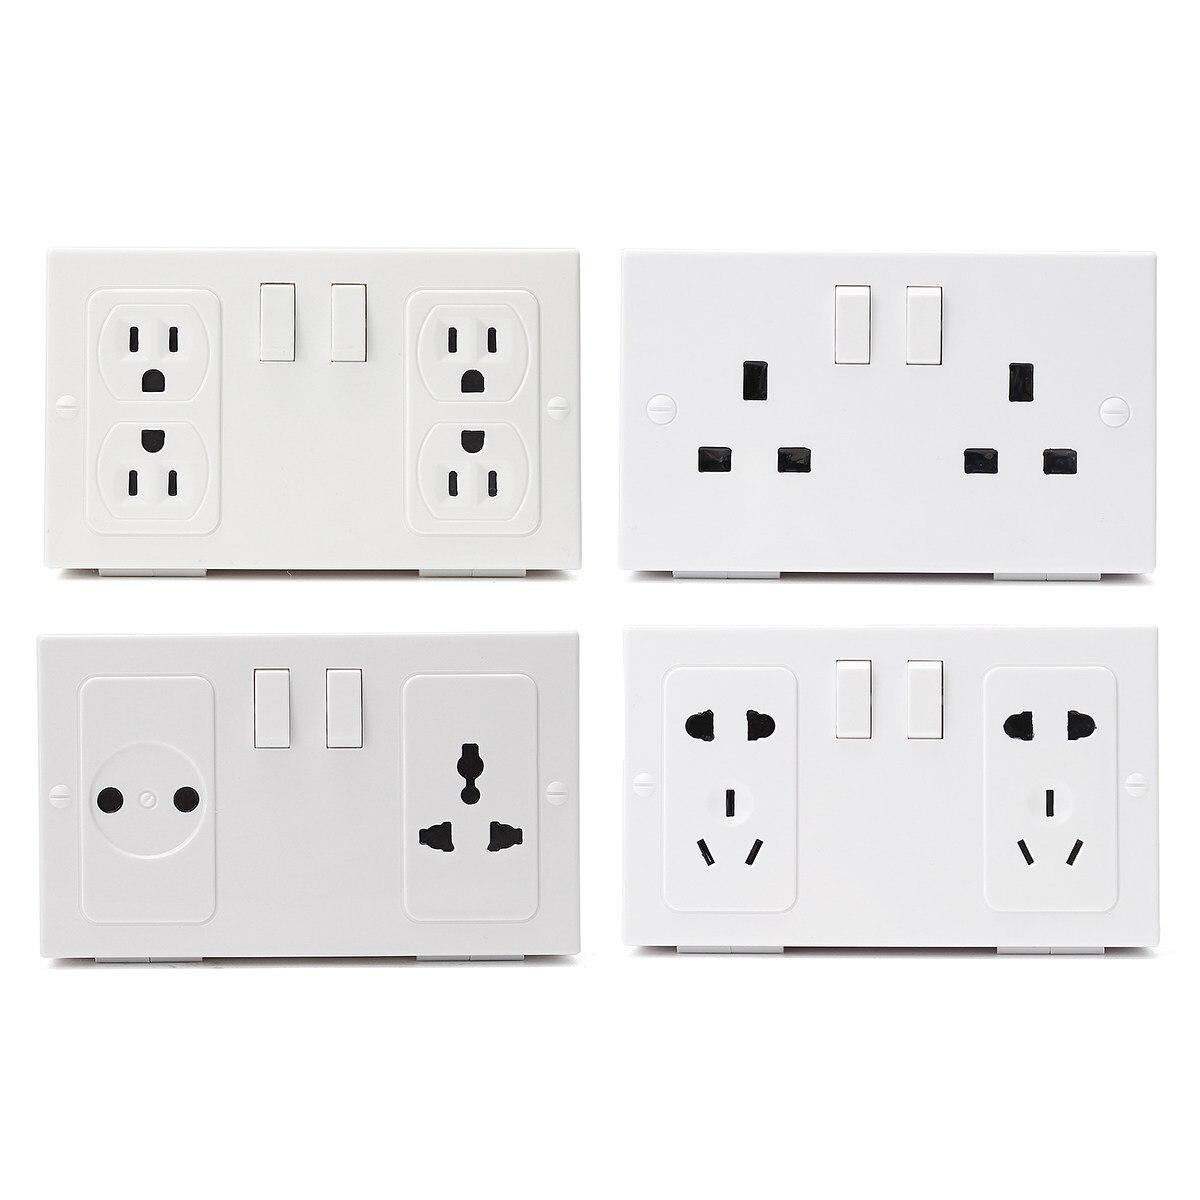 White Socket Imitation Valuables Safe Storage Box Bin Wall Hanging Double Plug Security Stash Box Home Wall Sundries Organizer